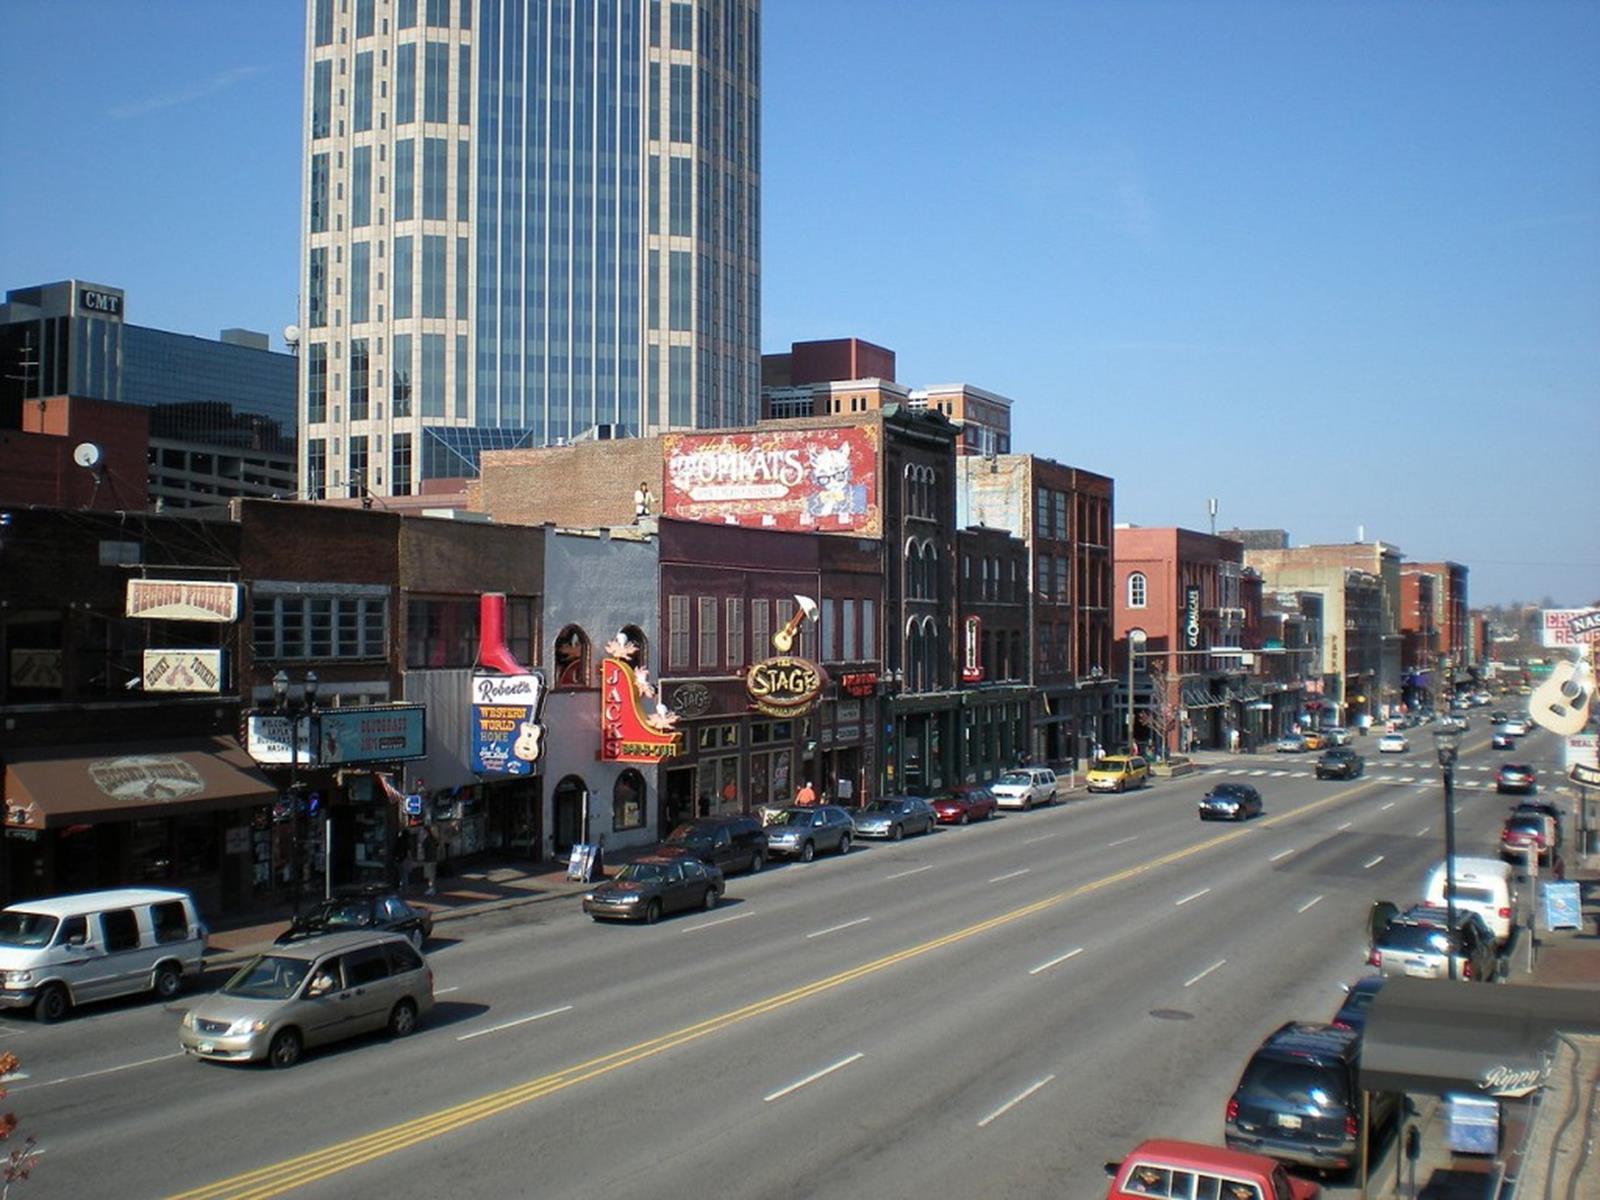 School Trips to Nashville, Music City USA